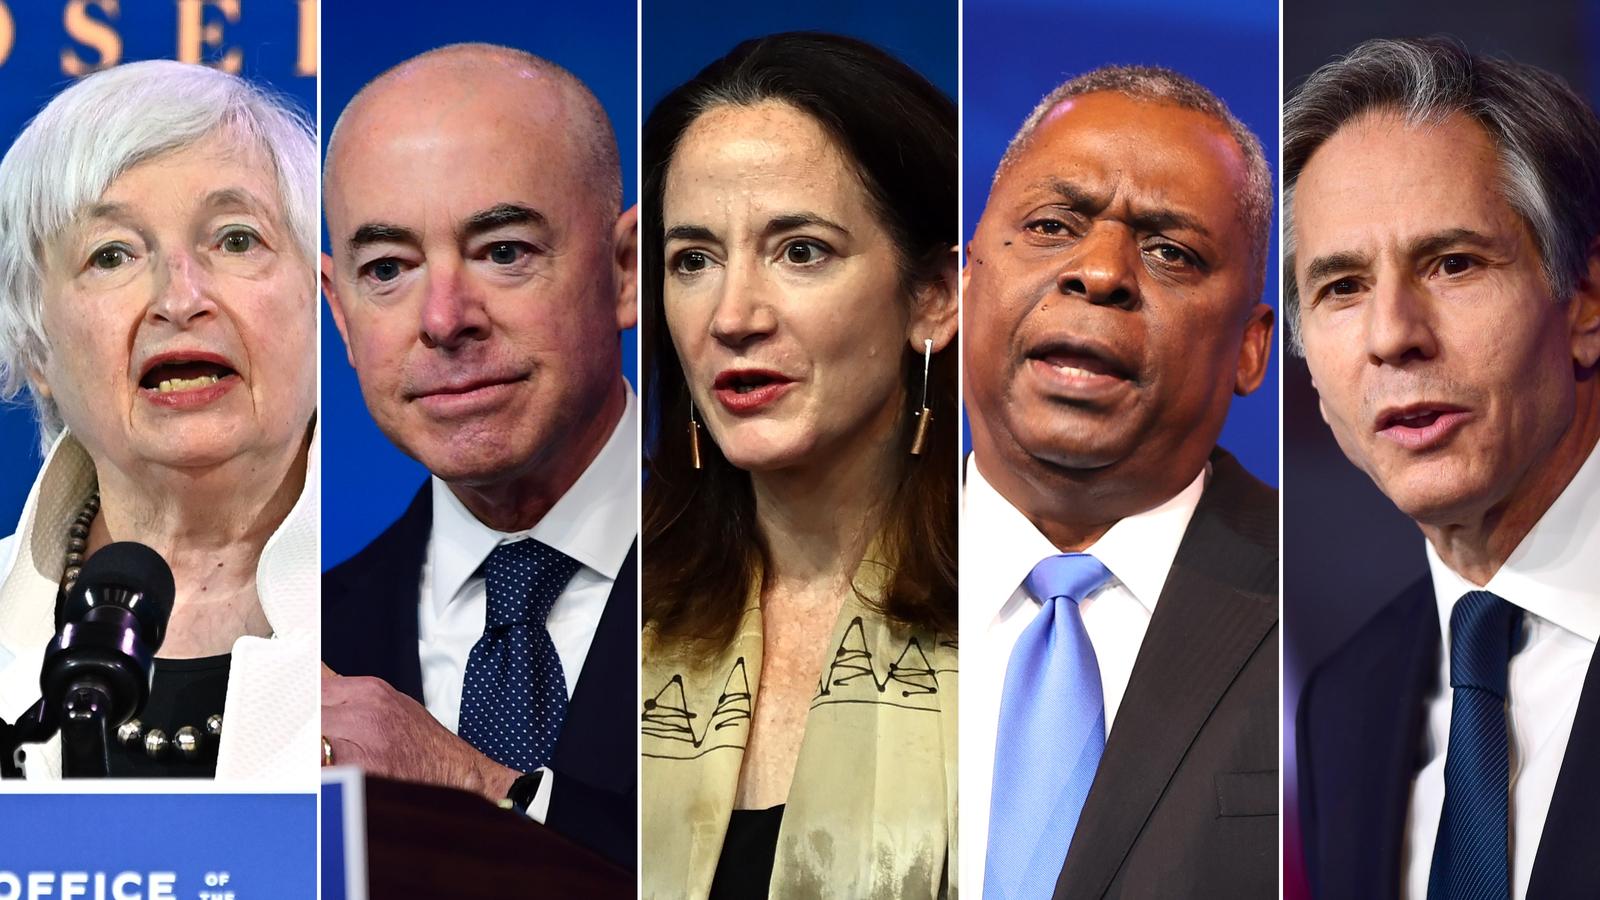 President Joe Biden's Cabinet nominees Janet Yellen, Alejandro Mayorkas, Avril Haines, Lloyd Austin and Antony Blinken.